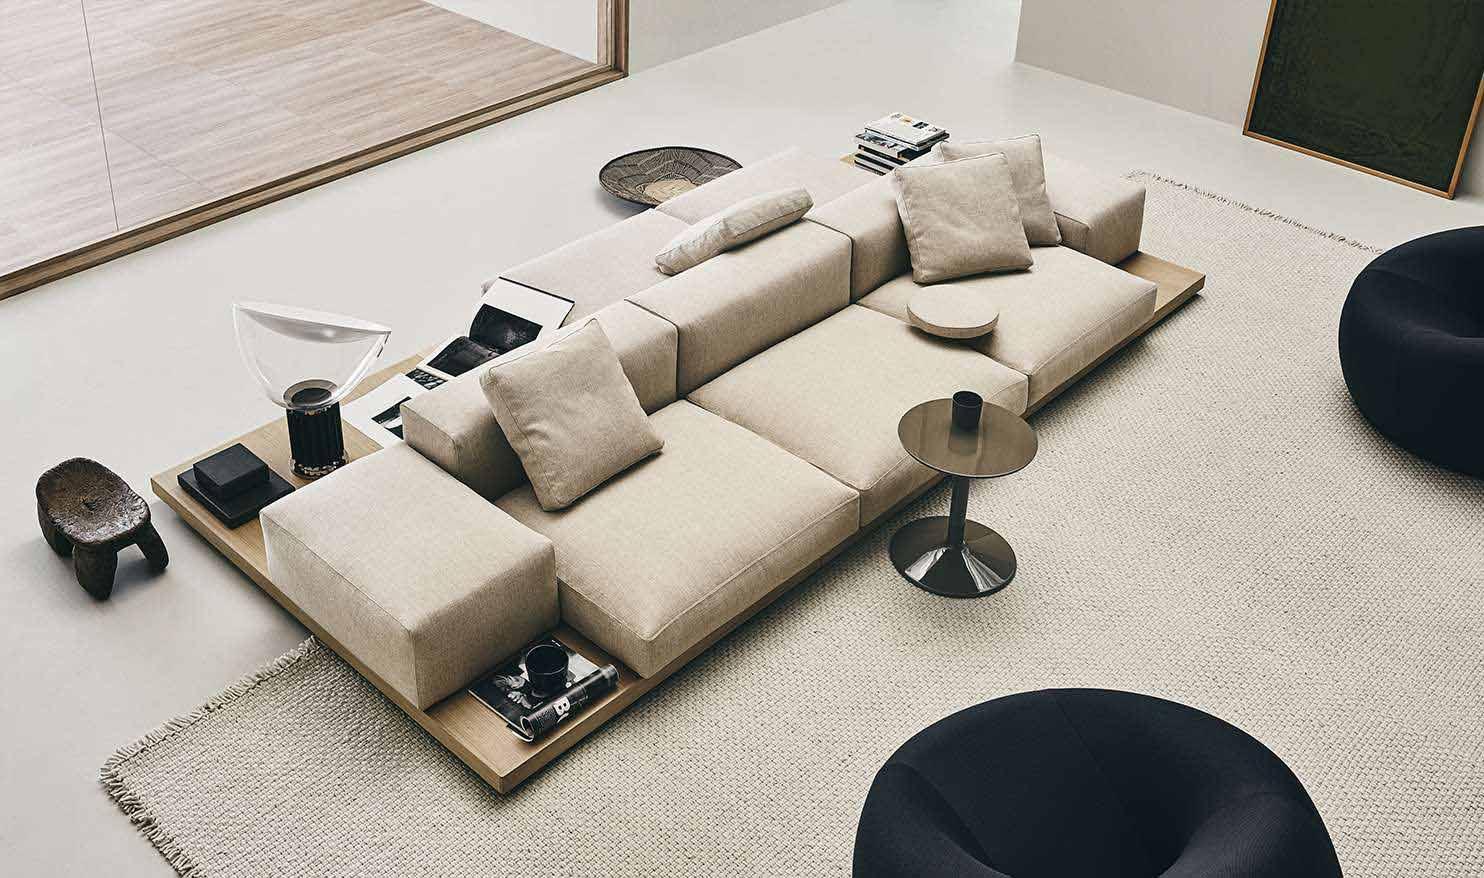 sofas-de-diseño-italiano-oscar-lacuesta-vitoria